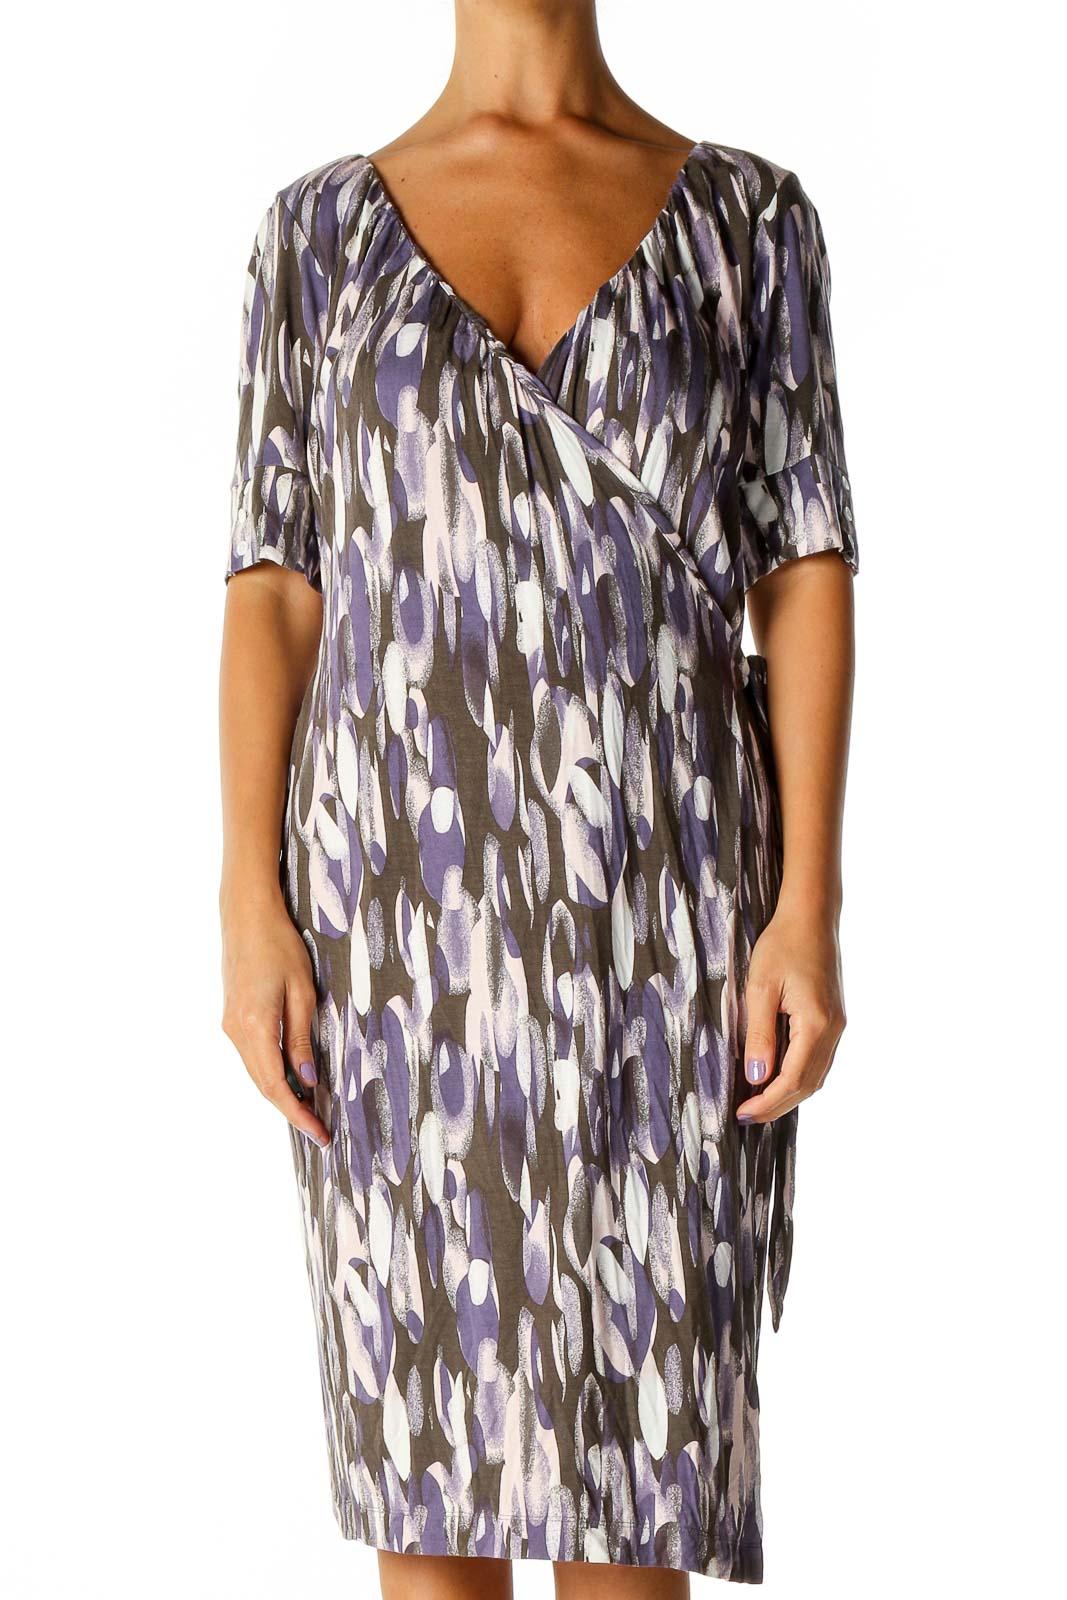 Purple Geometric Print Holiday Sheath Dress Front